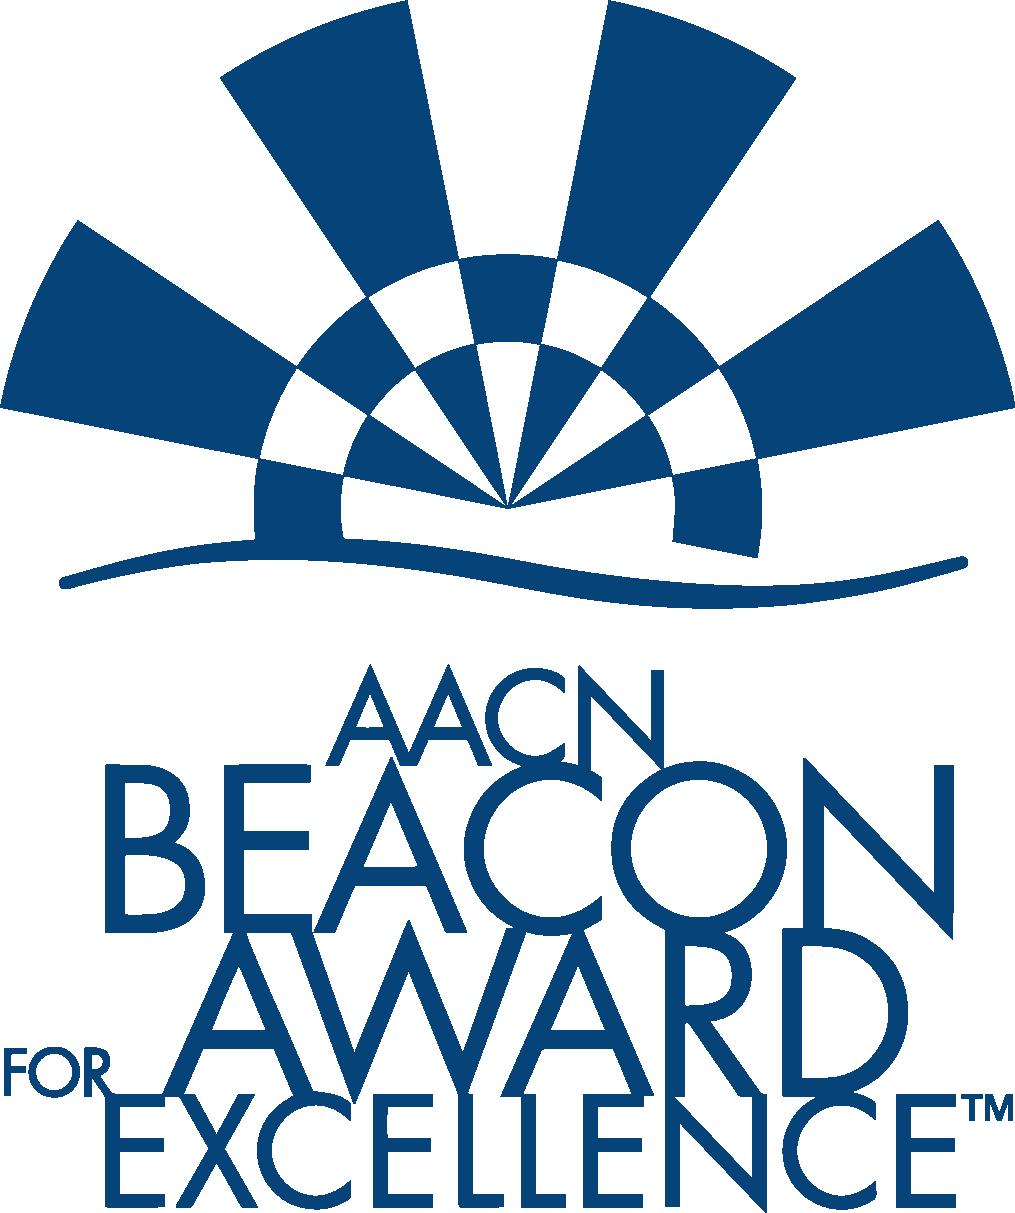 Critical care unit receives aacn beacon award of excellence news critical care unit receives aacn beacon award of excellence altavistaventures Image collections